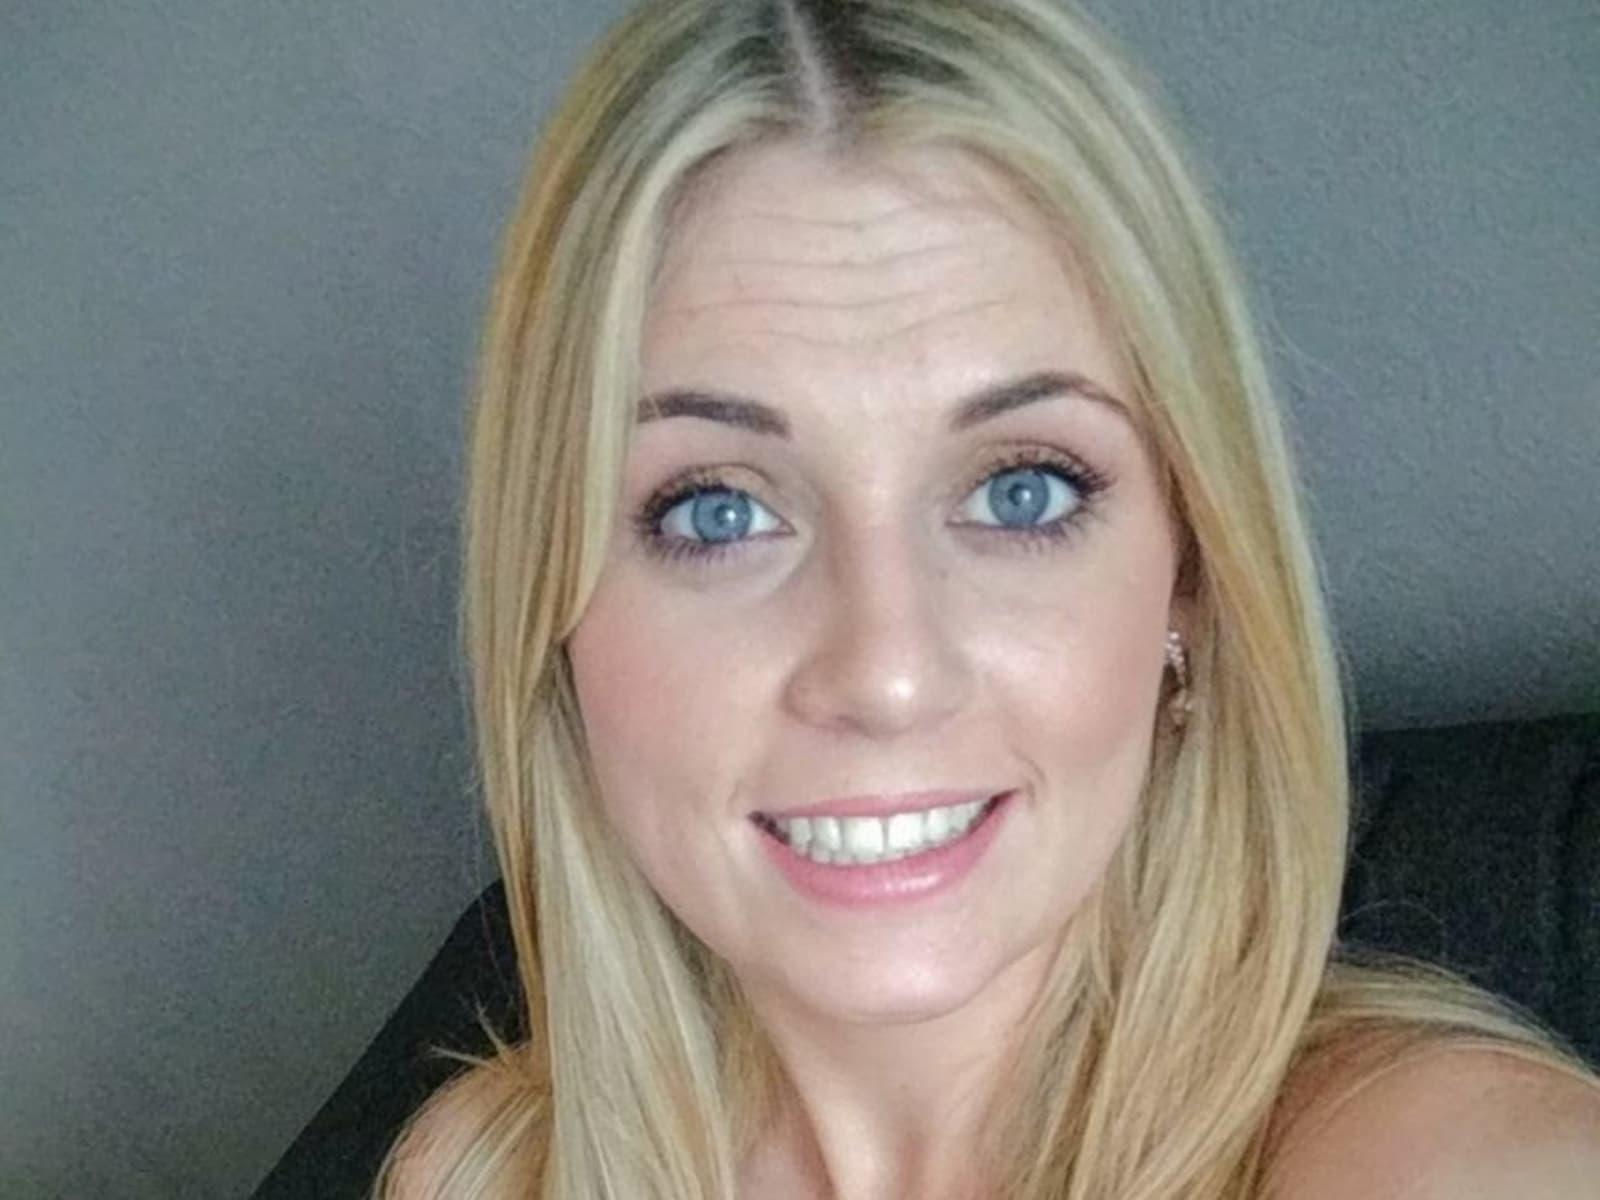 Emma from Sydney, New South Wales, Australia